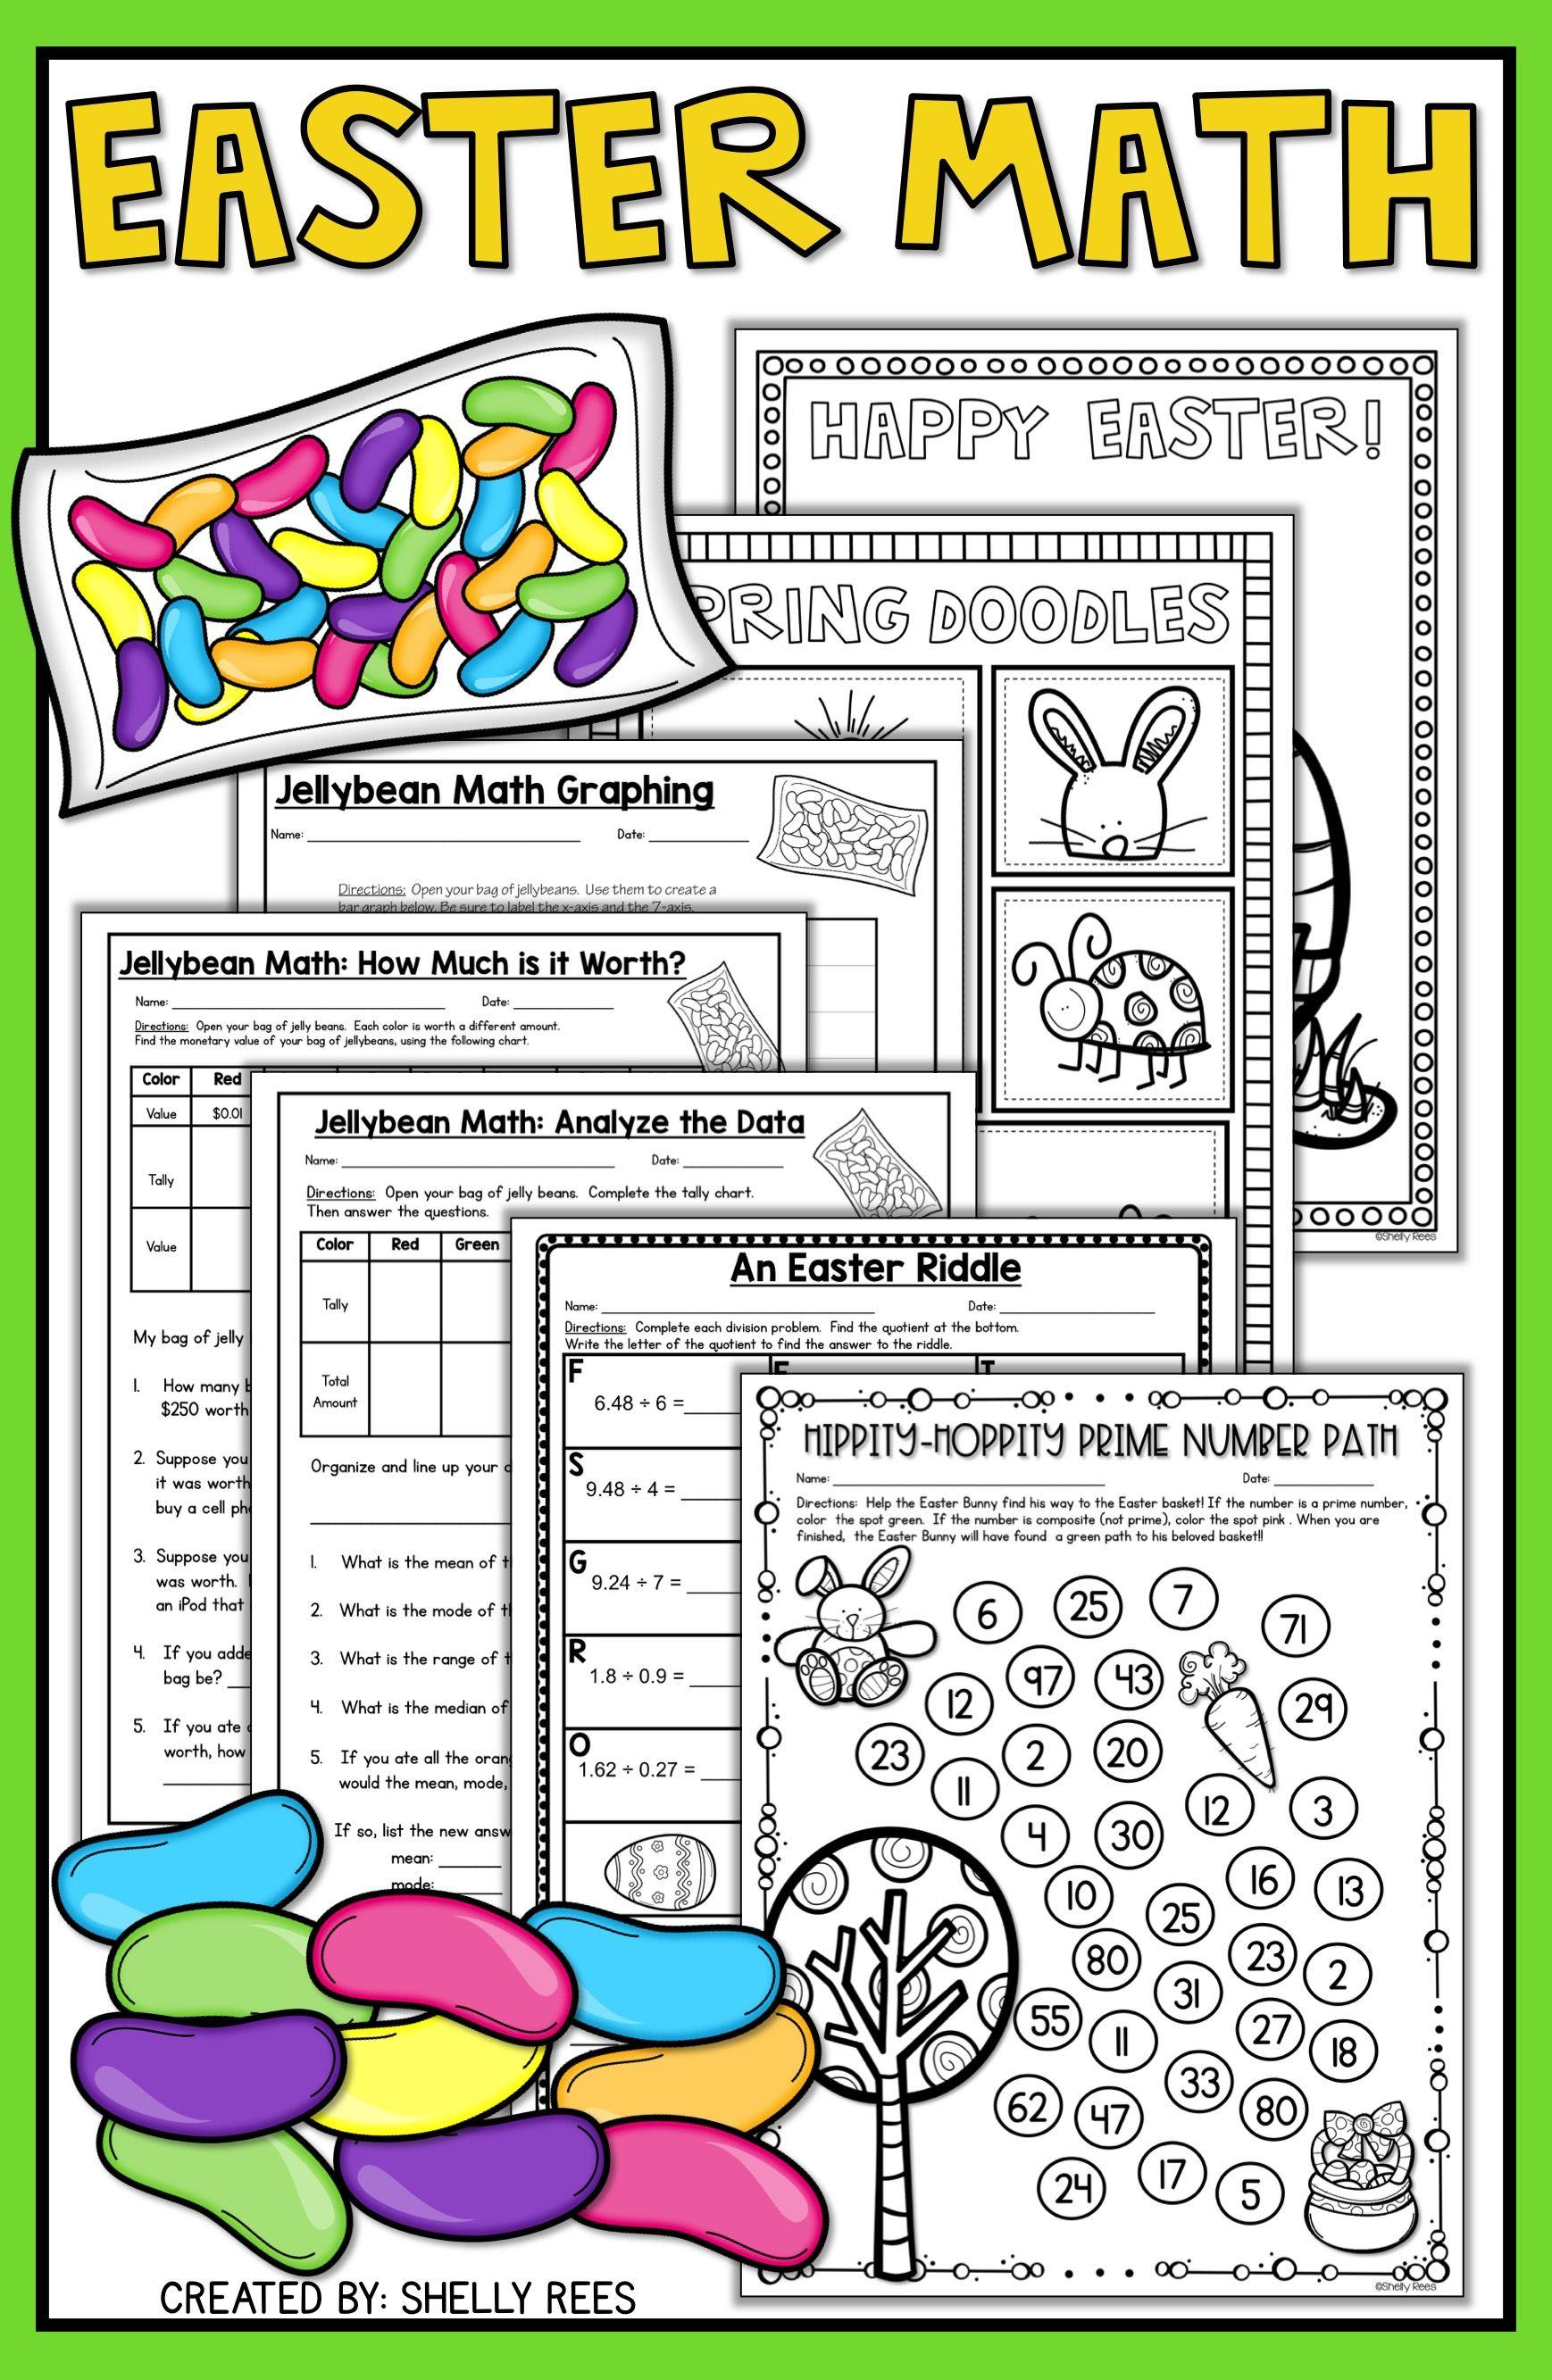 hight resolution of Easter Math Worksheets - Jellybean Math - Easter Activities   Easter math